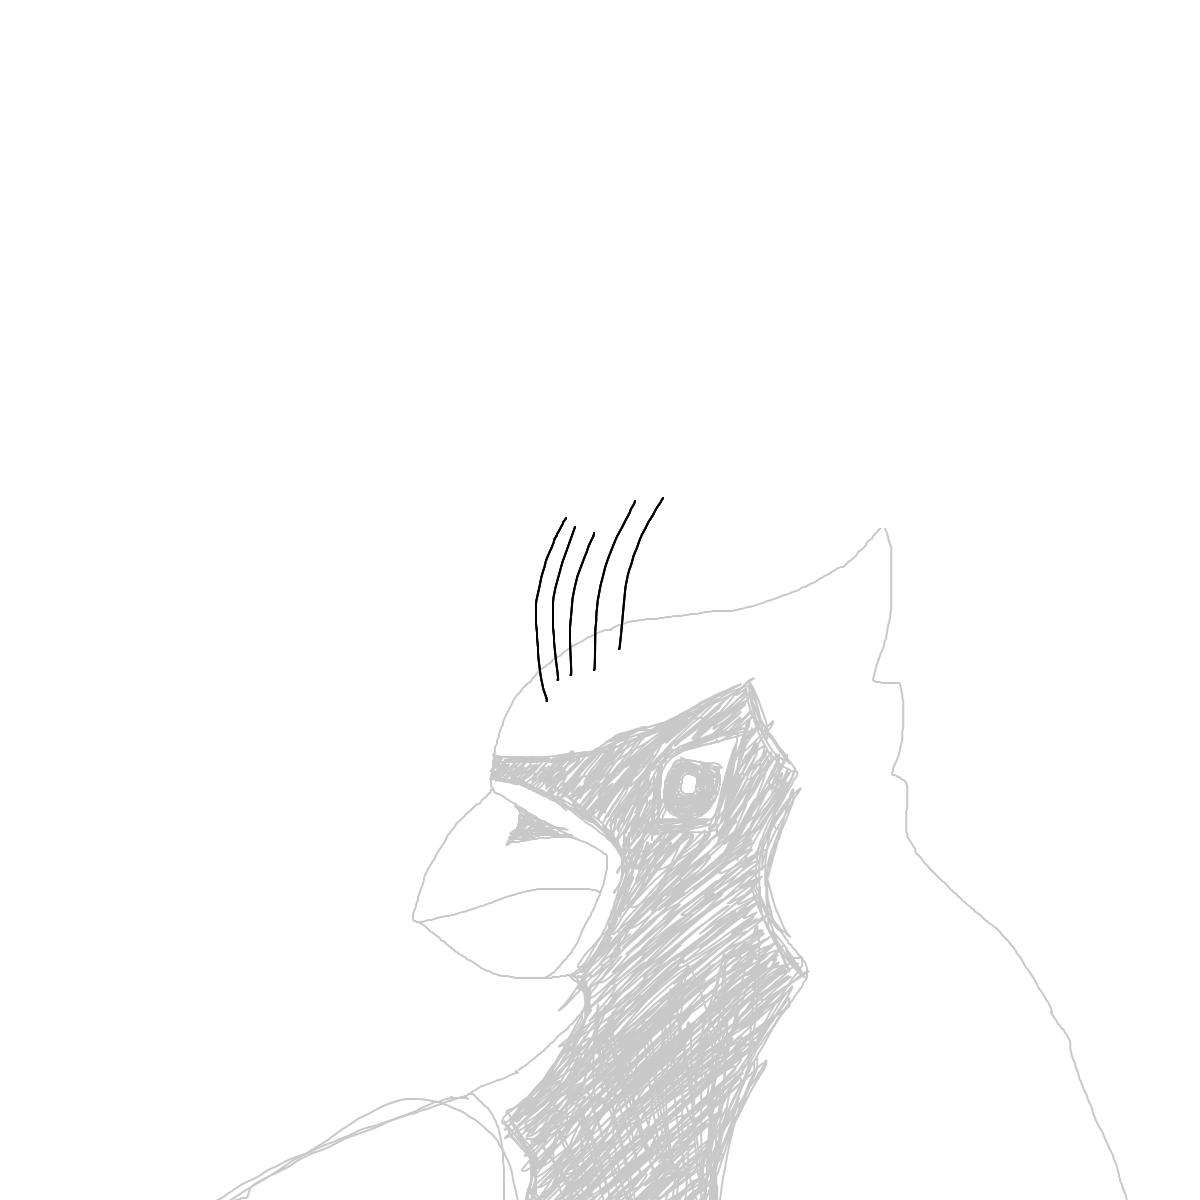 BAAAM drawing#23368 lat:41.9478607177734400lng: -87.6557922363281200